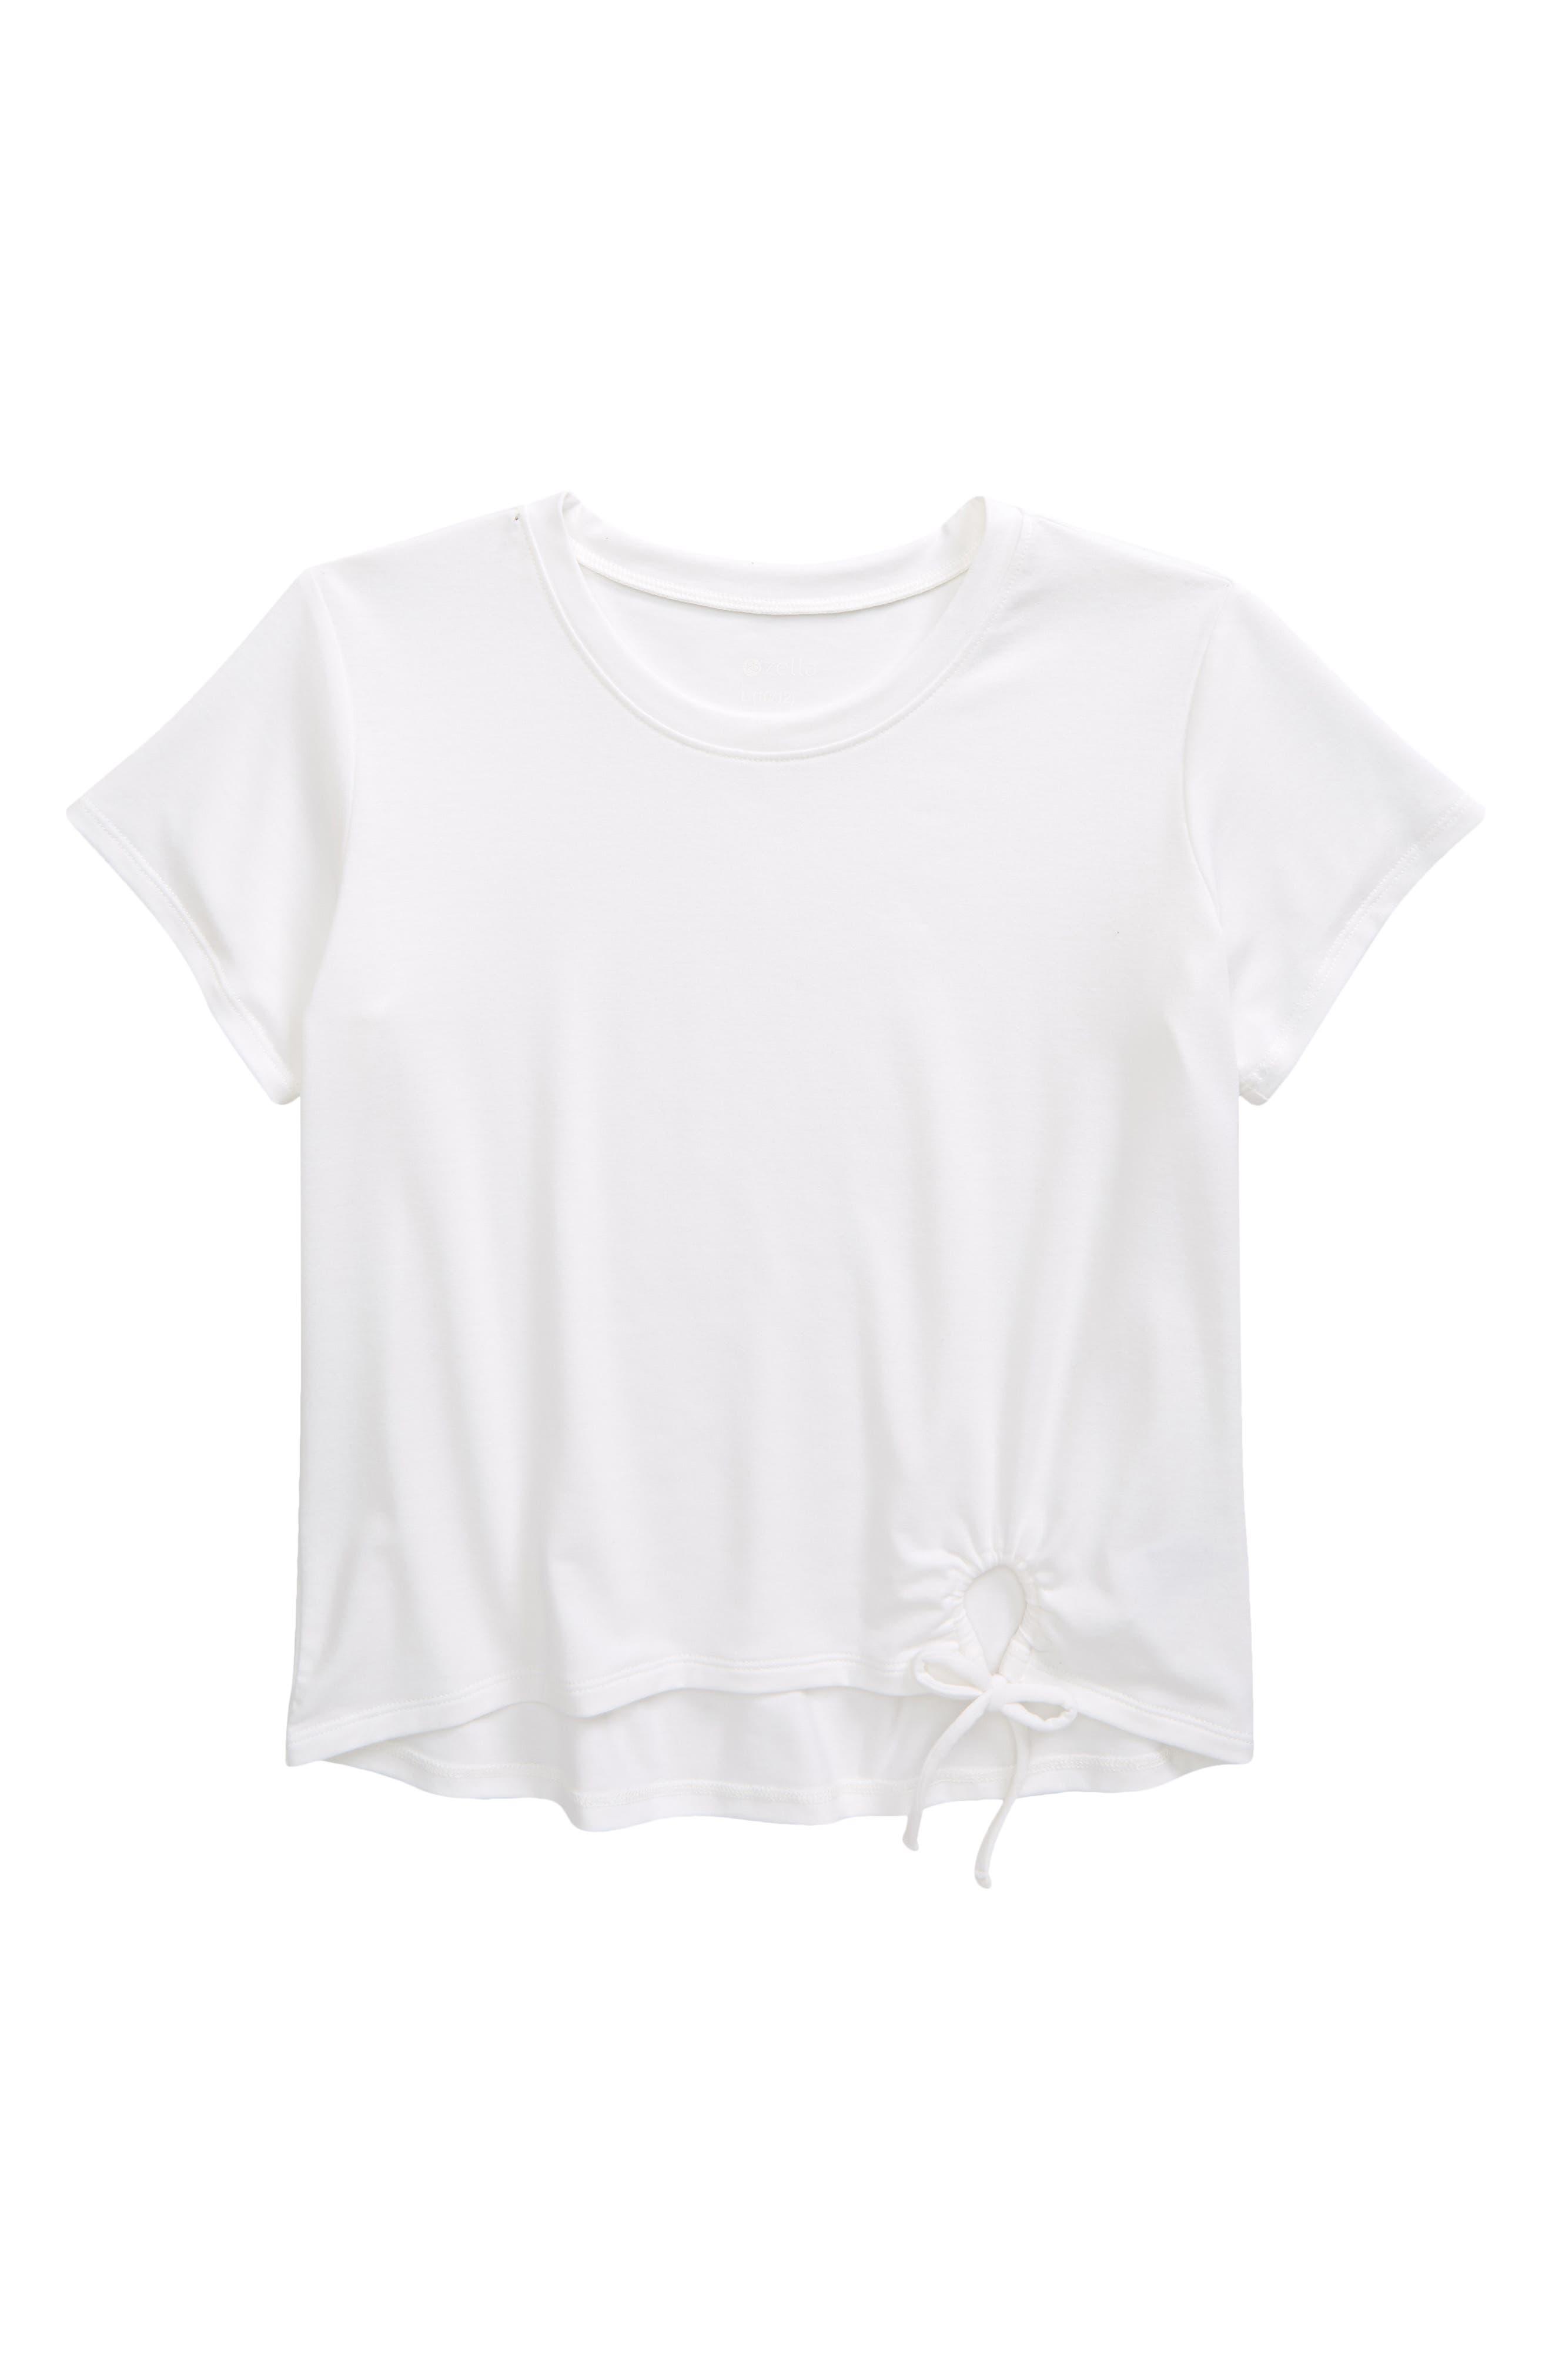 LA Gear Ladies Womens T Shirt Gym V Neck Running Sports Top 8 10 12 14 16 18 20